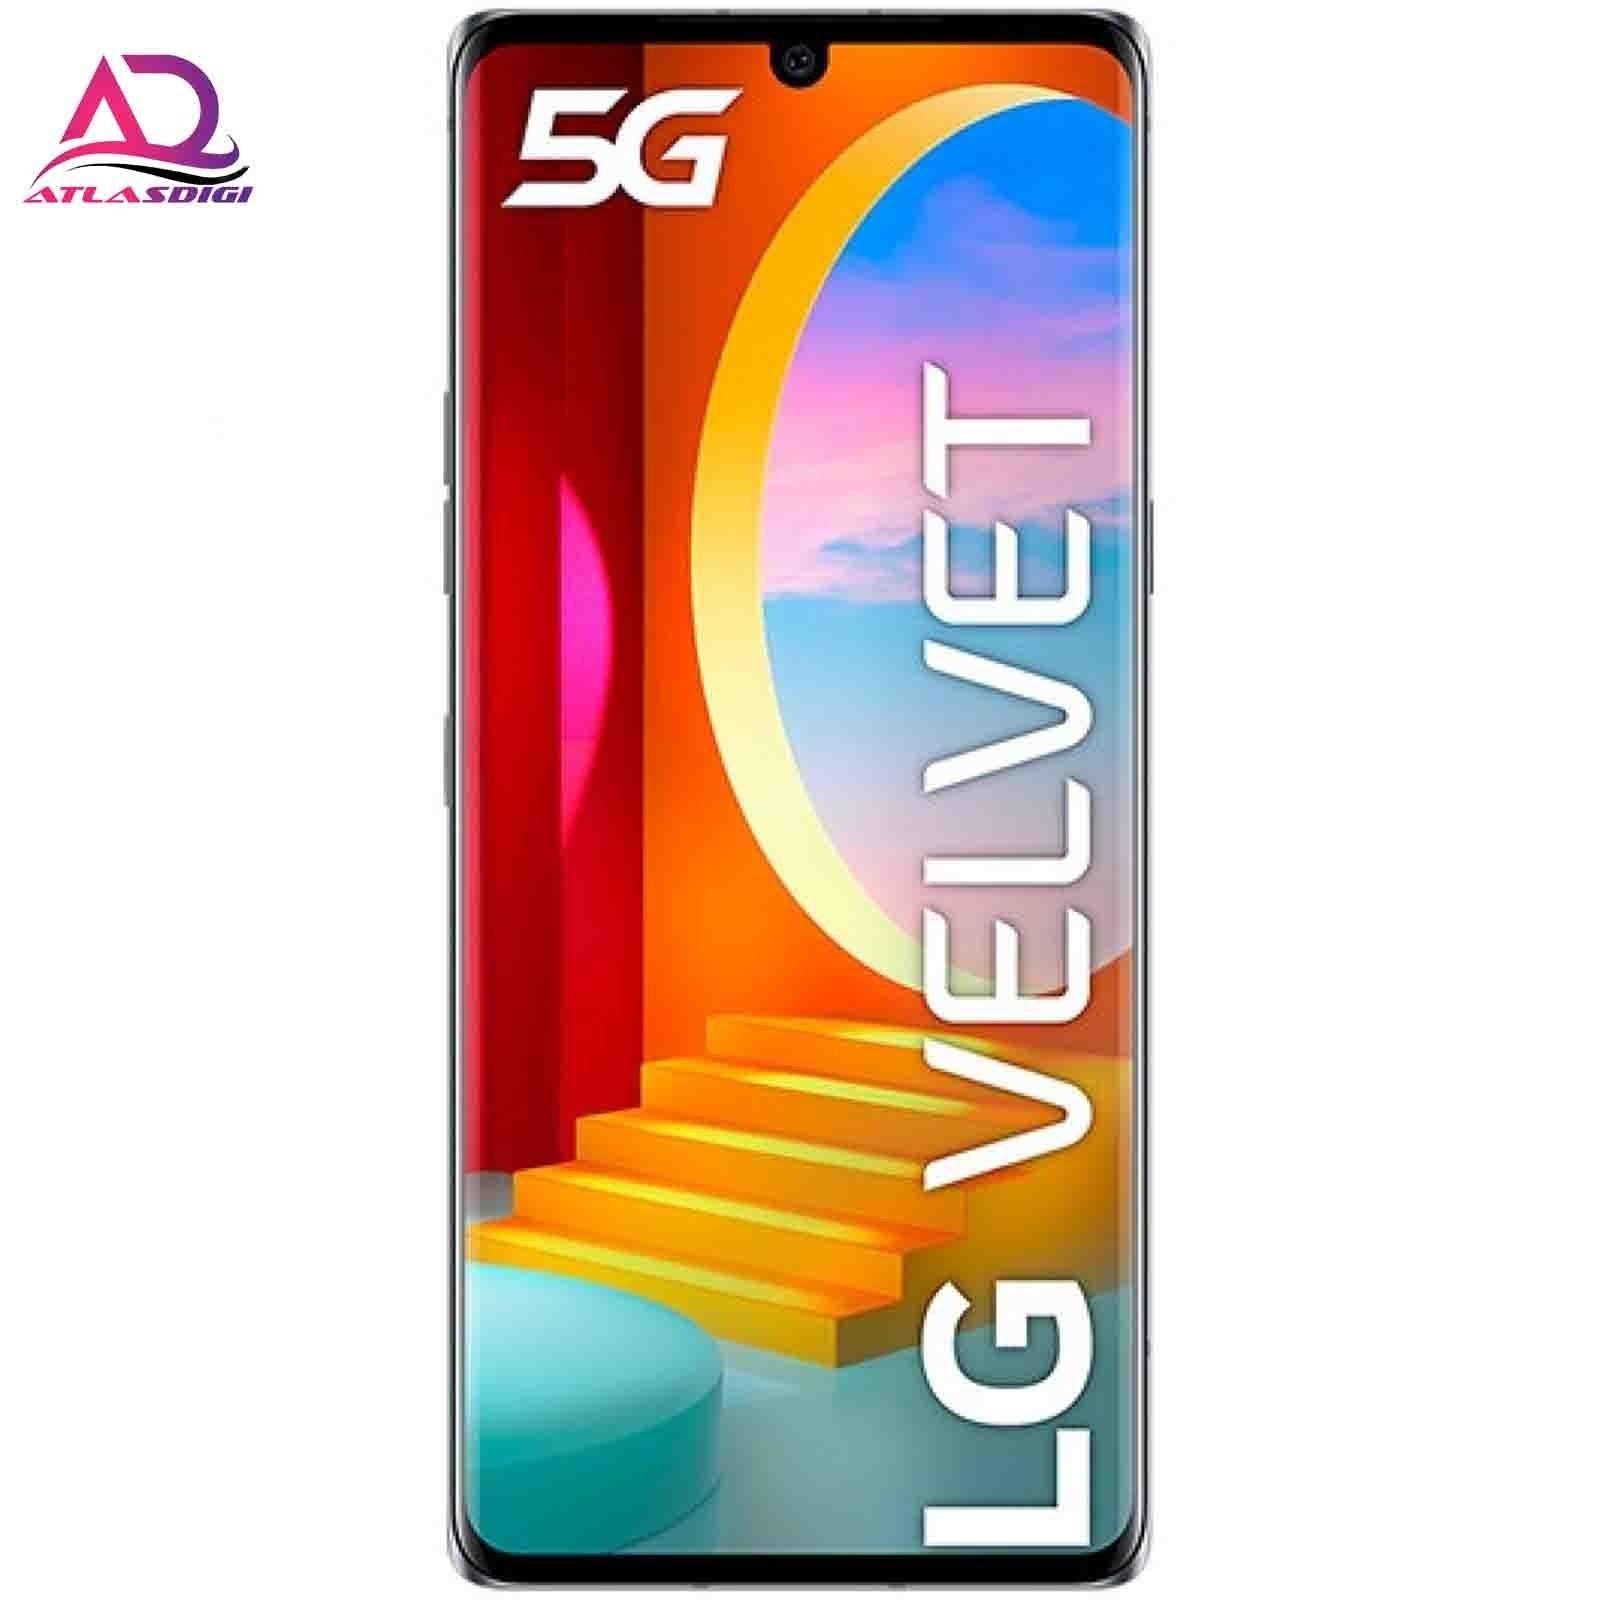 main images گوشی موبایل الجی مدل Velvet دو سیم کارت ظرفیت 128/6 گیگابایت